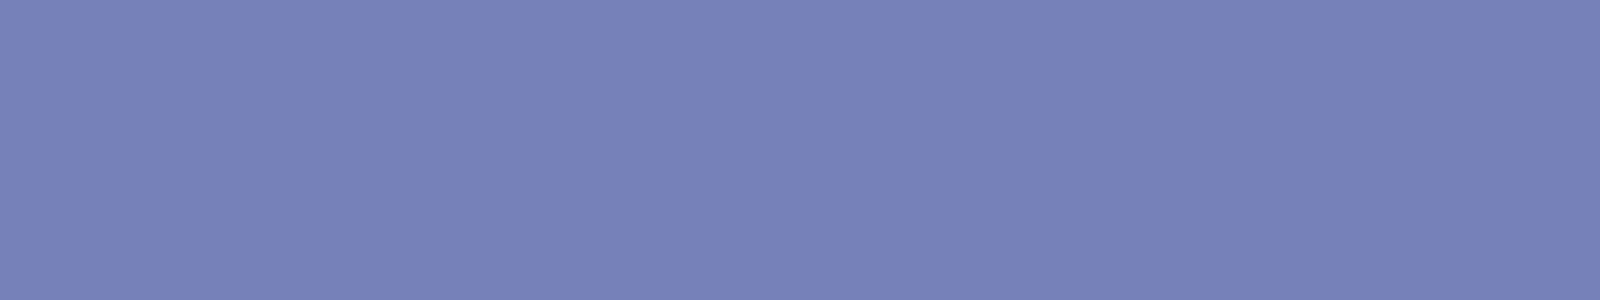 colorbar1600